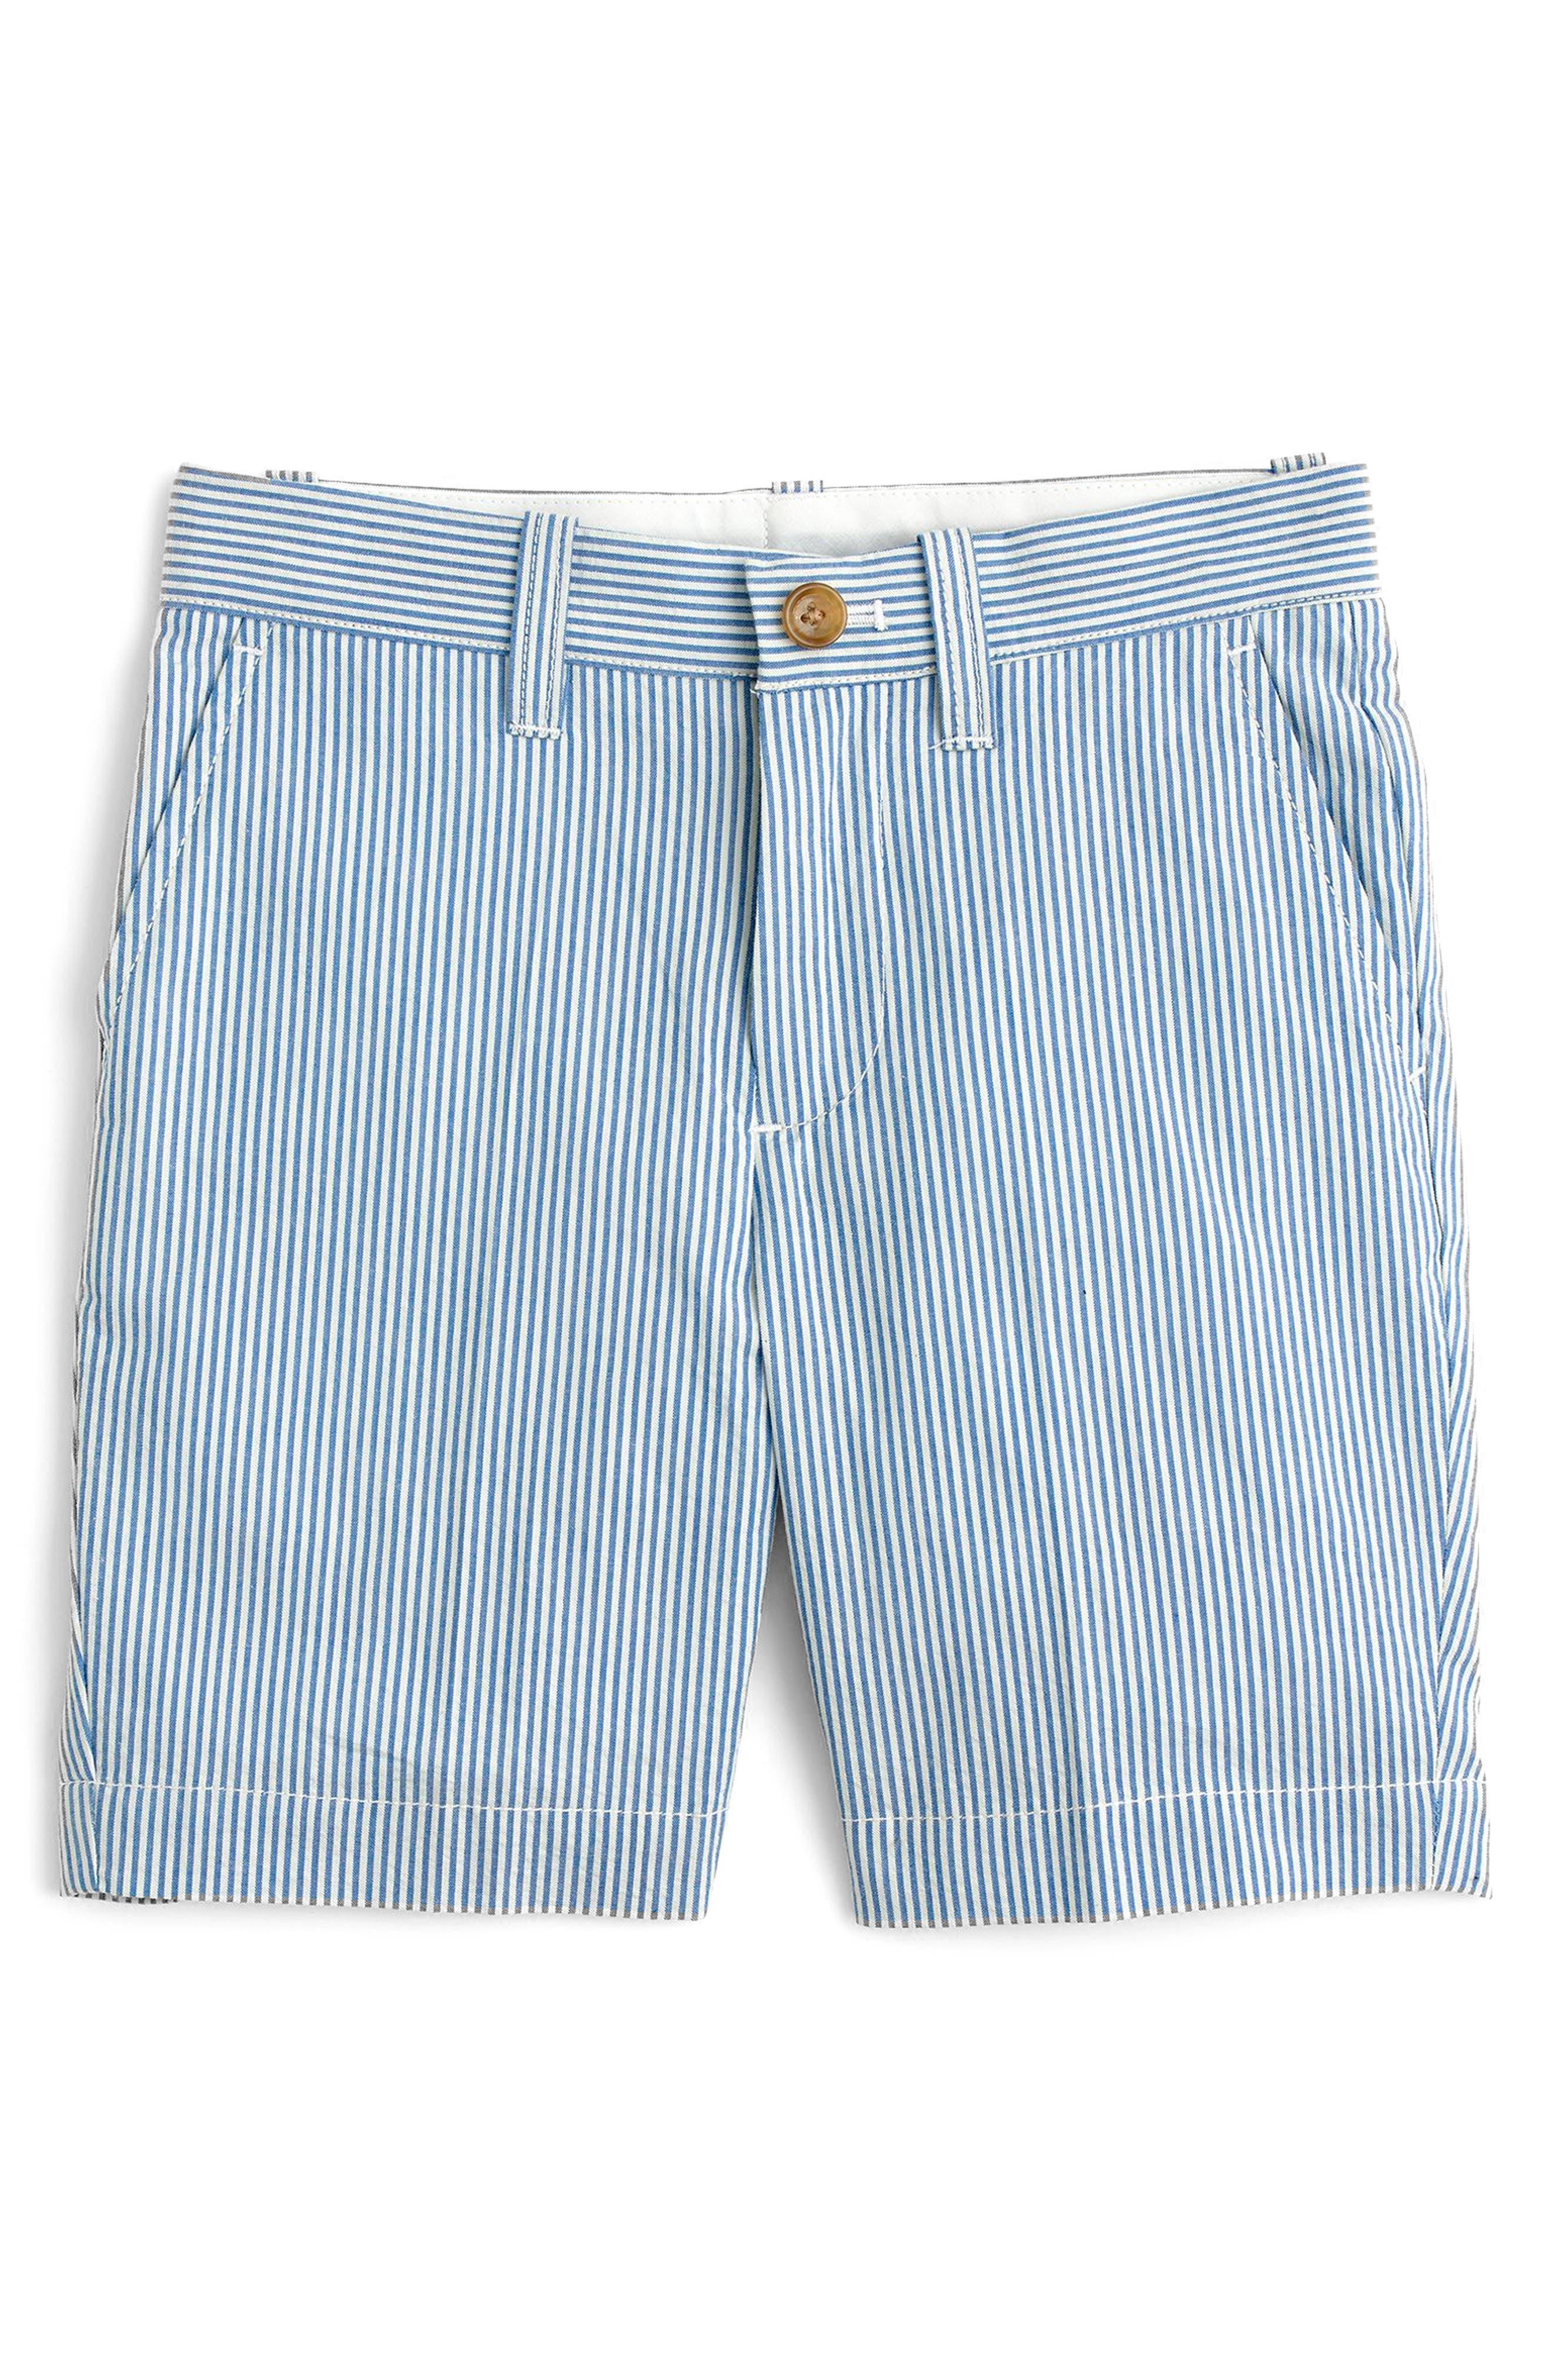 crewcuts by J.Crew Seersucker Shorts (Toddler Boys, Little Boys & Big Boys)